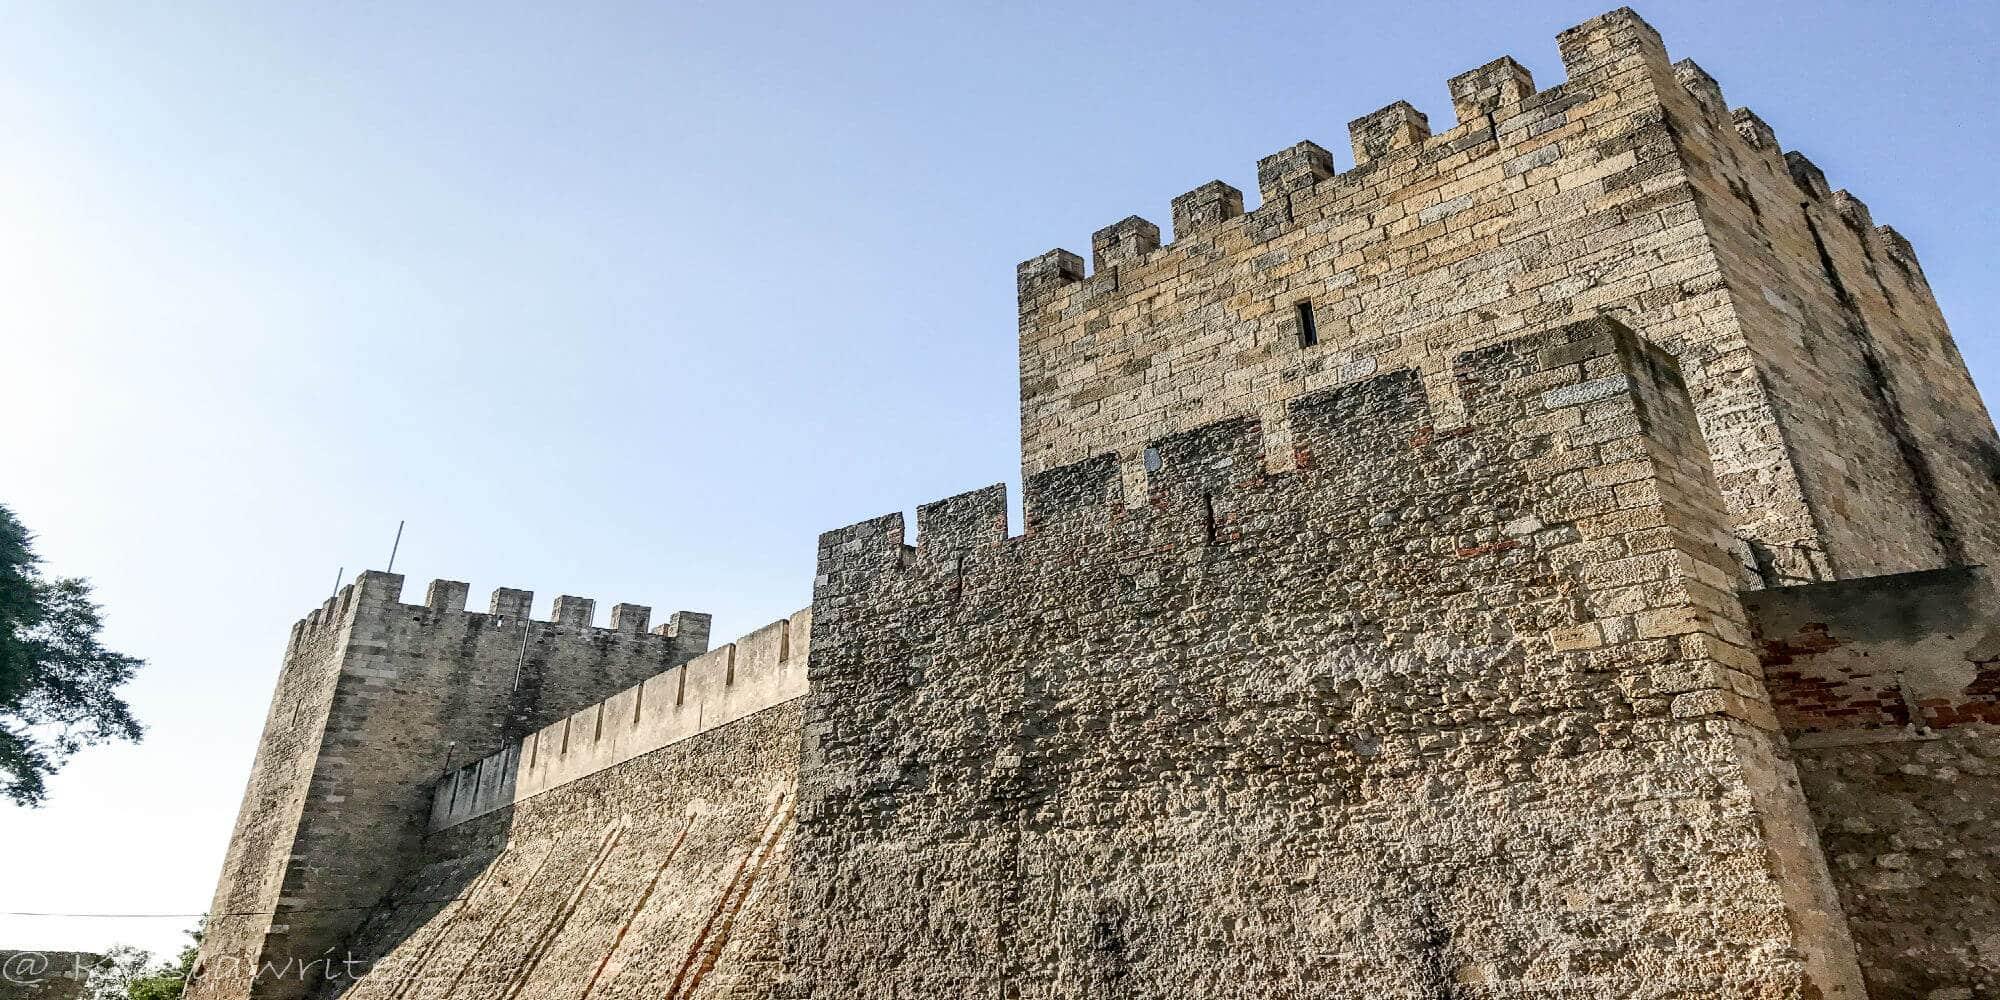 Visiting Lisbon's Castelo de Sao Jorge | kasiawrites cultural travel